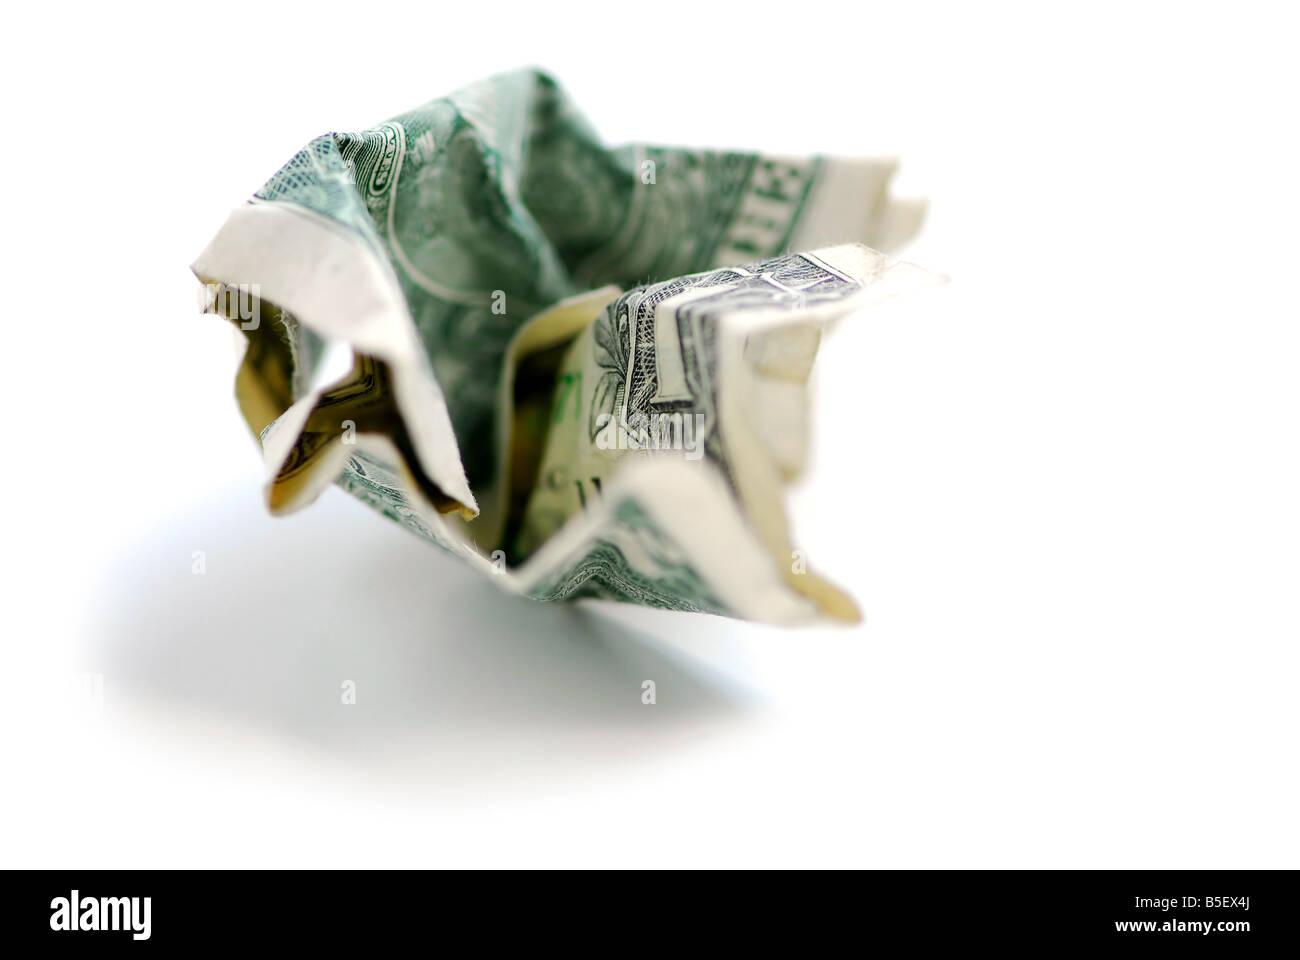 Crumpled one us dollar bill - Stock Image